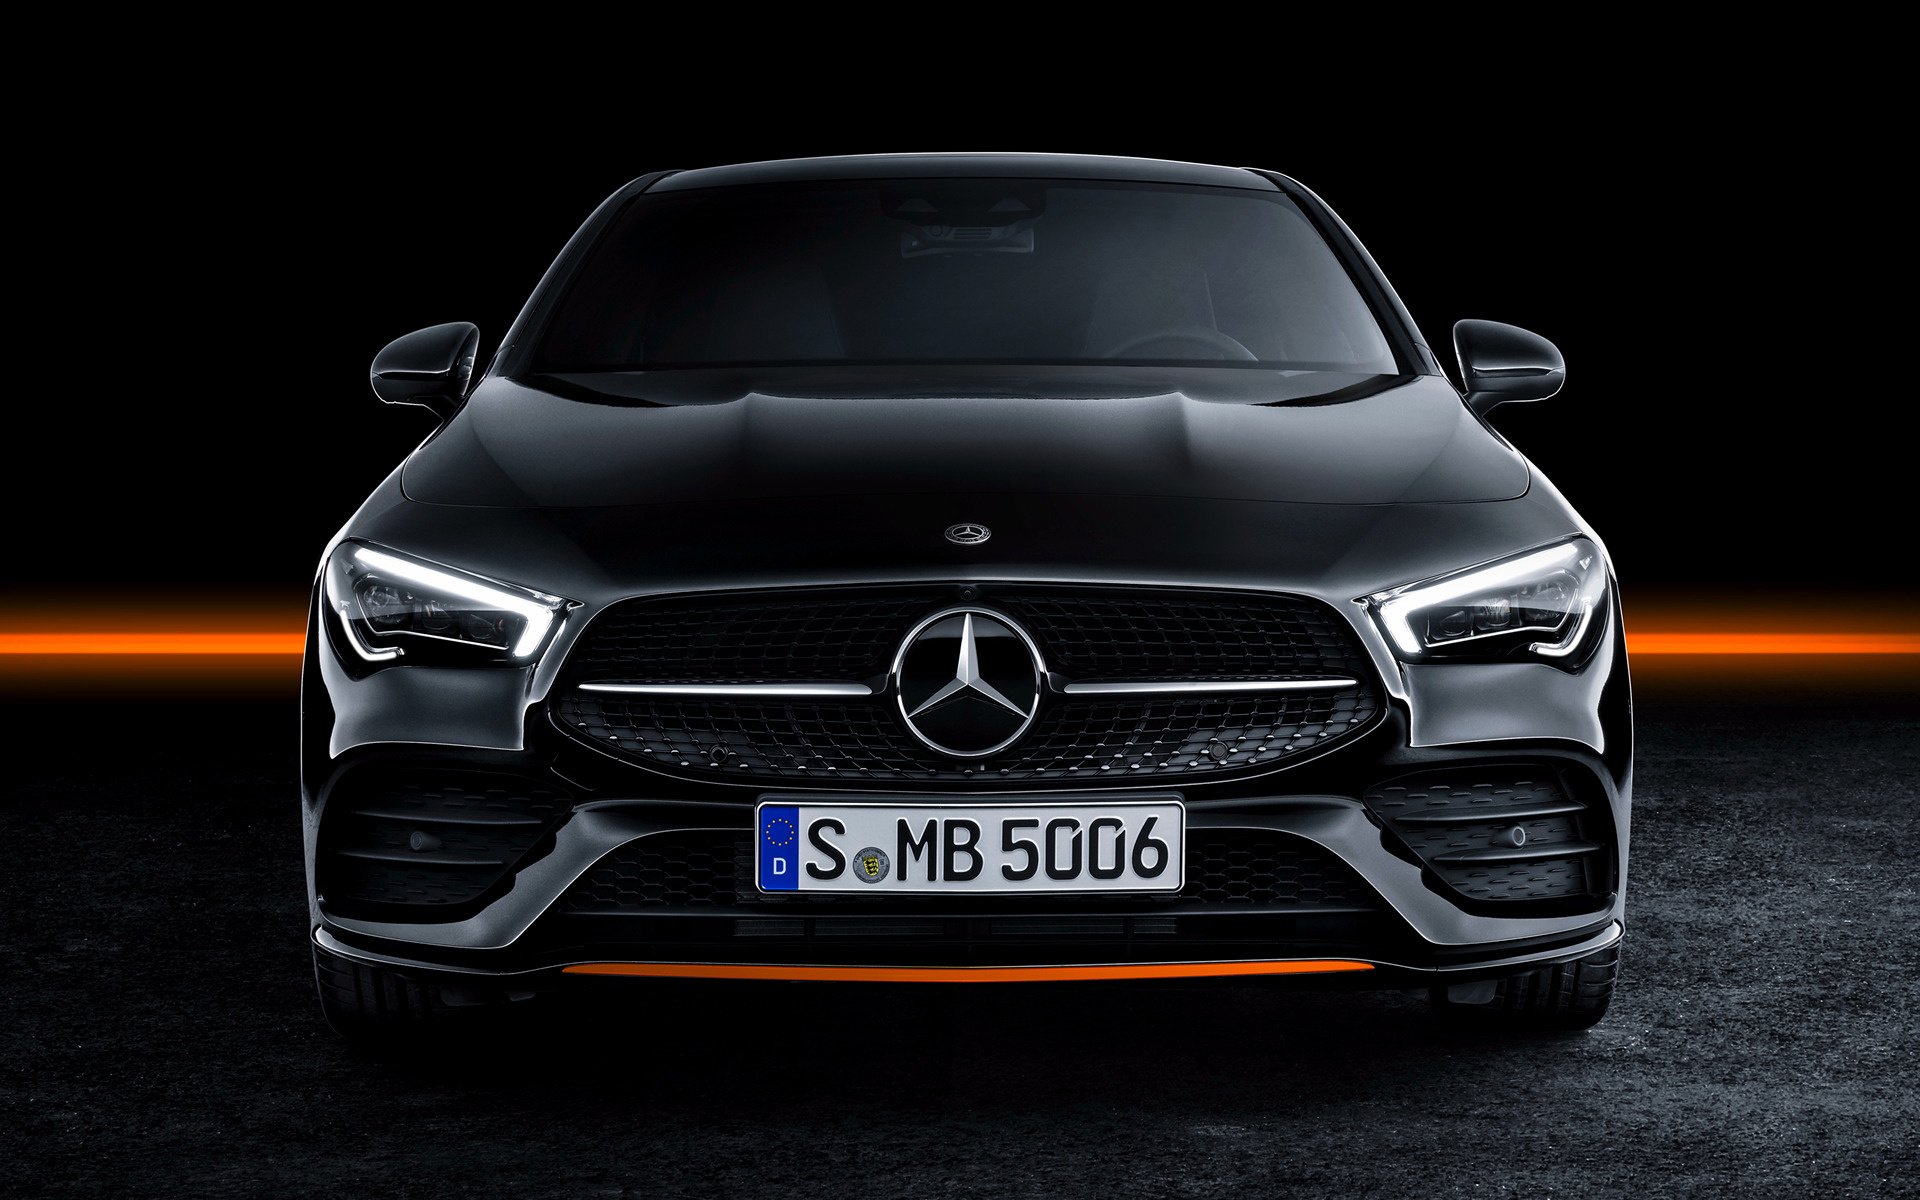 2019 Mercedes Benz Cla Class Orangeart Edition Fonds D Ecran Et Images Hd Car Pixel